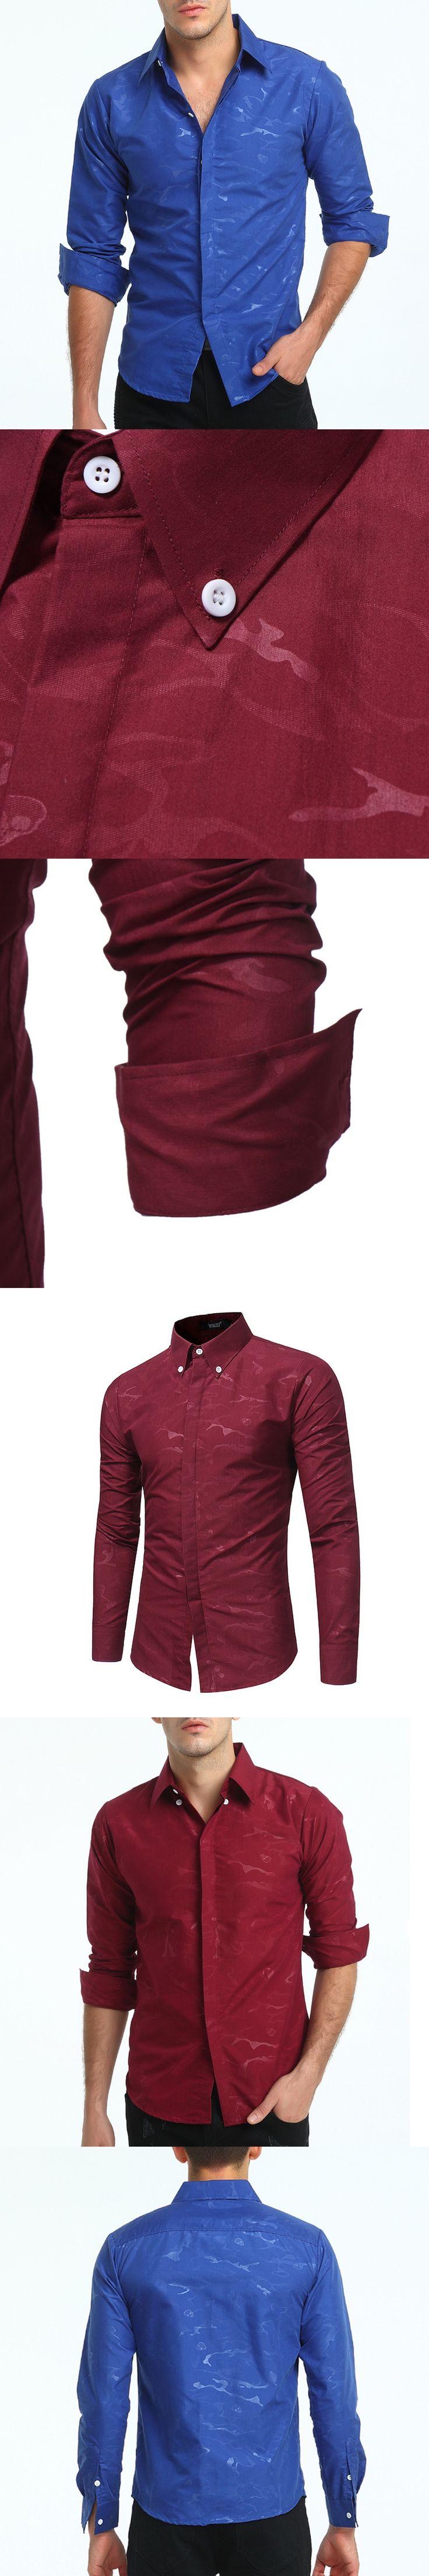 Brand Camouflage Shirt Men Skull Print Mens Dress Shirts 2017 Fashion Long Sleeve Slim Fit Men Shirt Casual Social Cotton Camisa